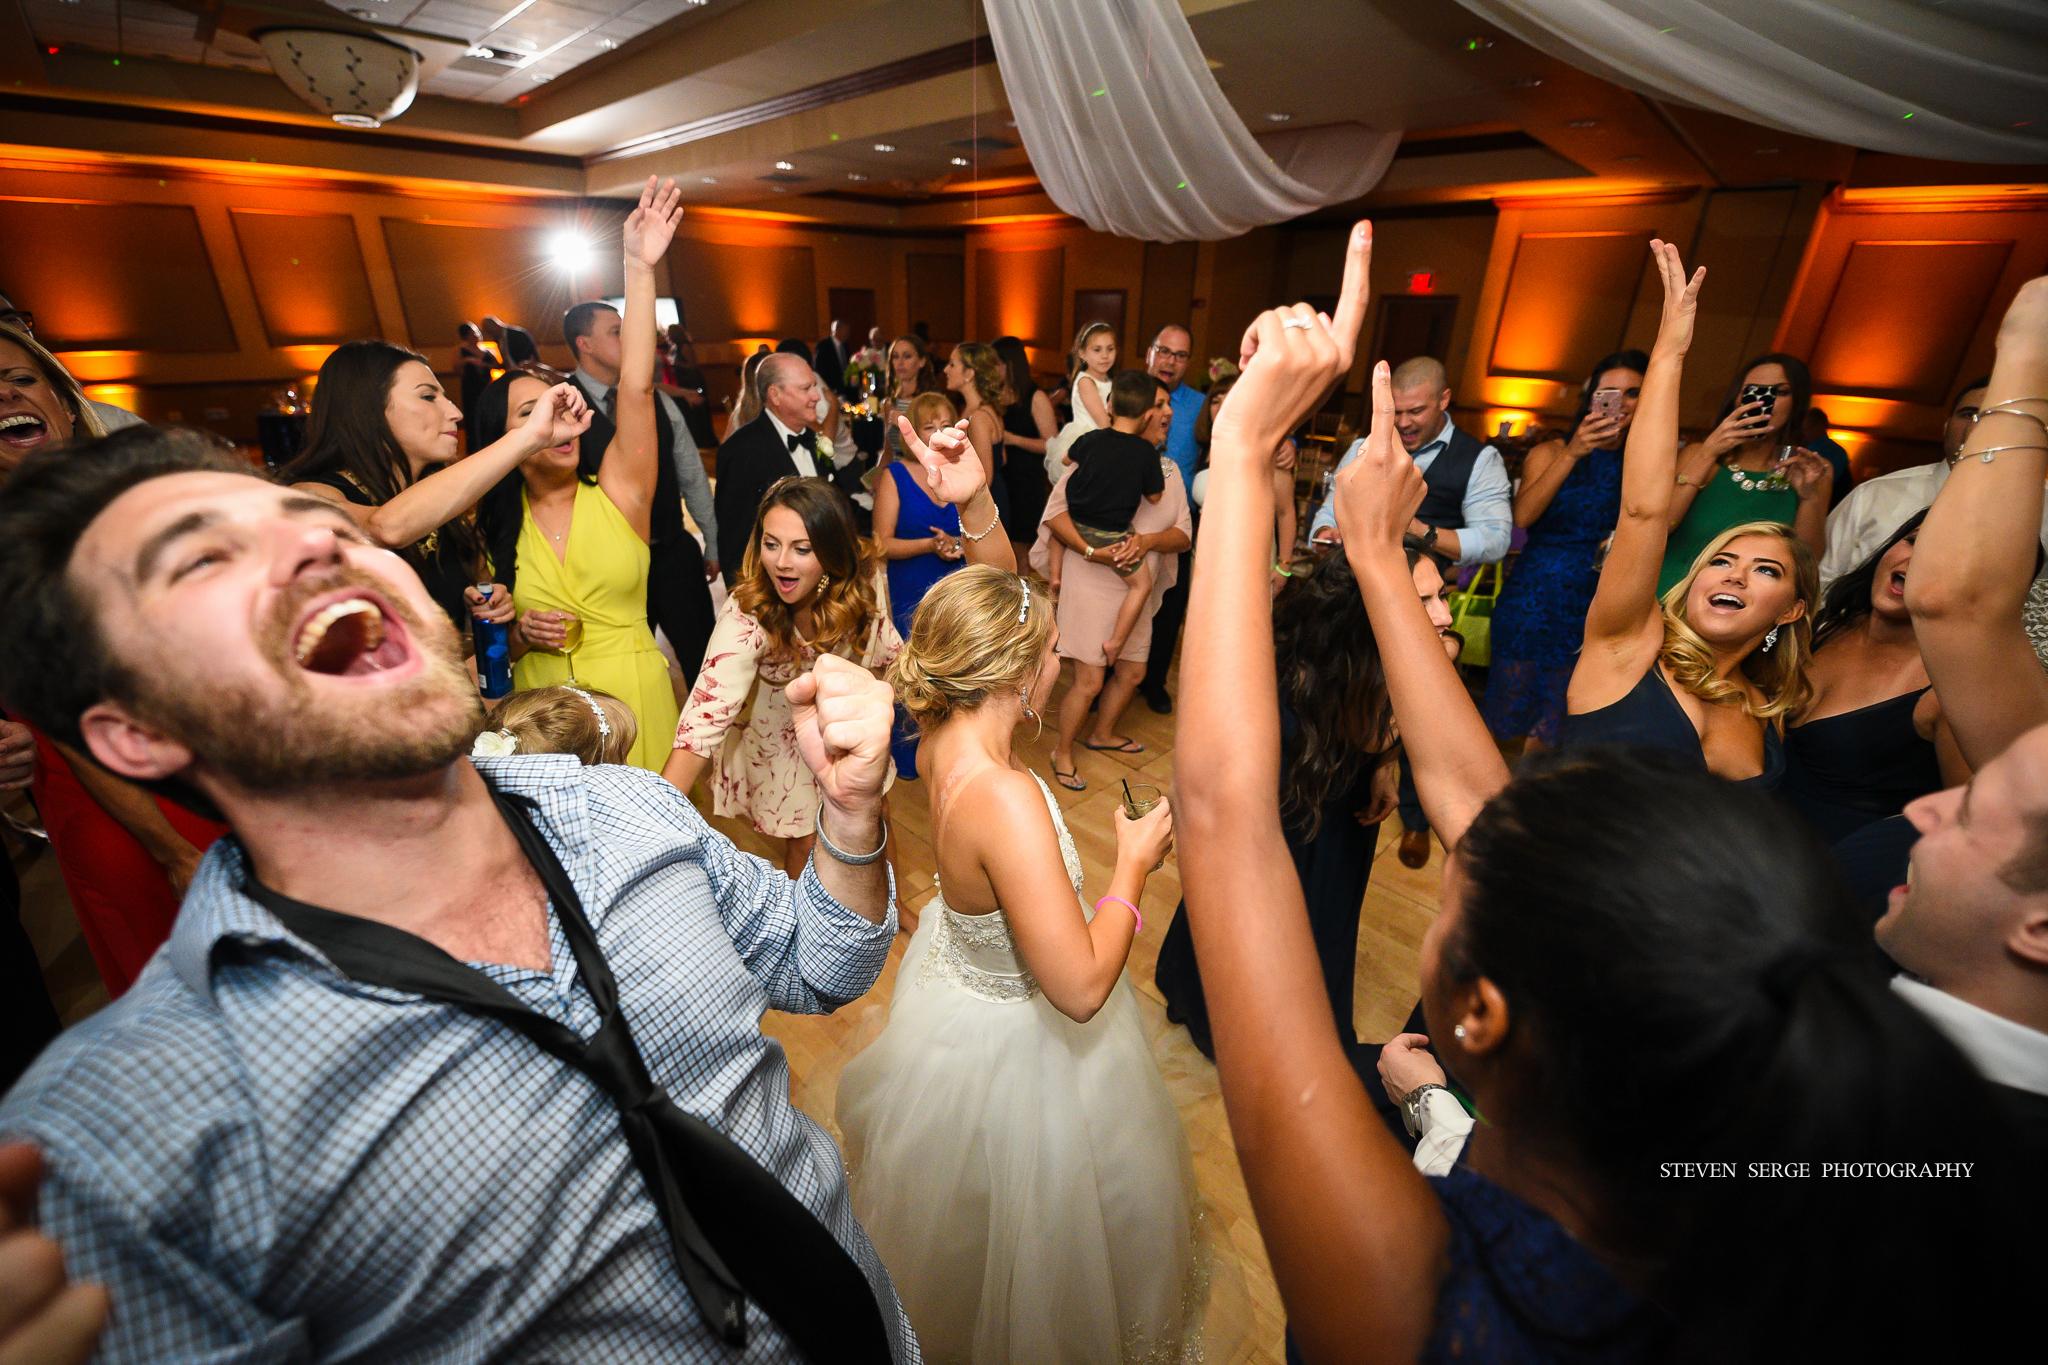 scranton-wedding-photographers-hilton-steven-serge-photography-40.jpg